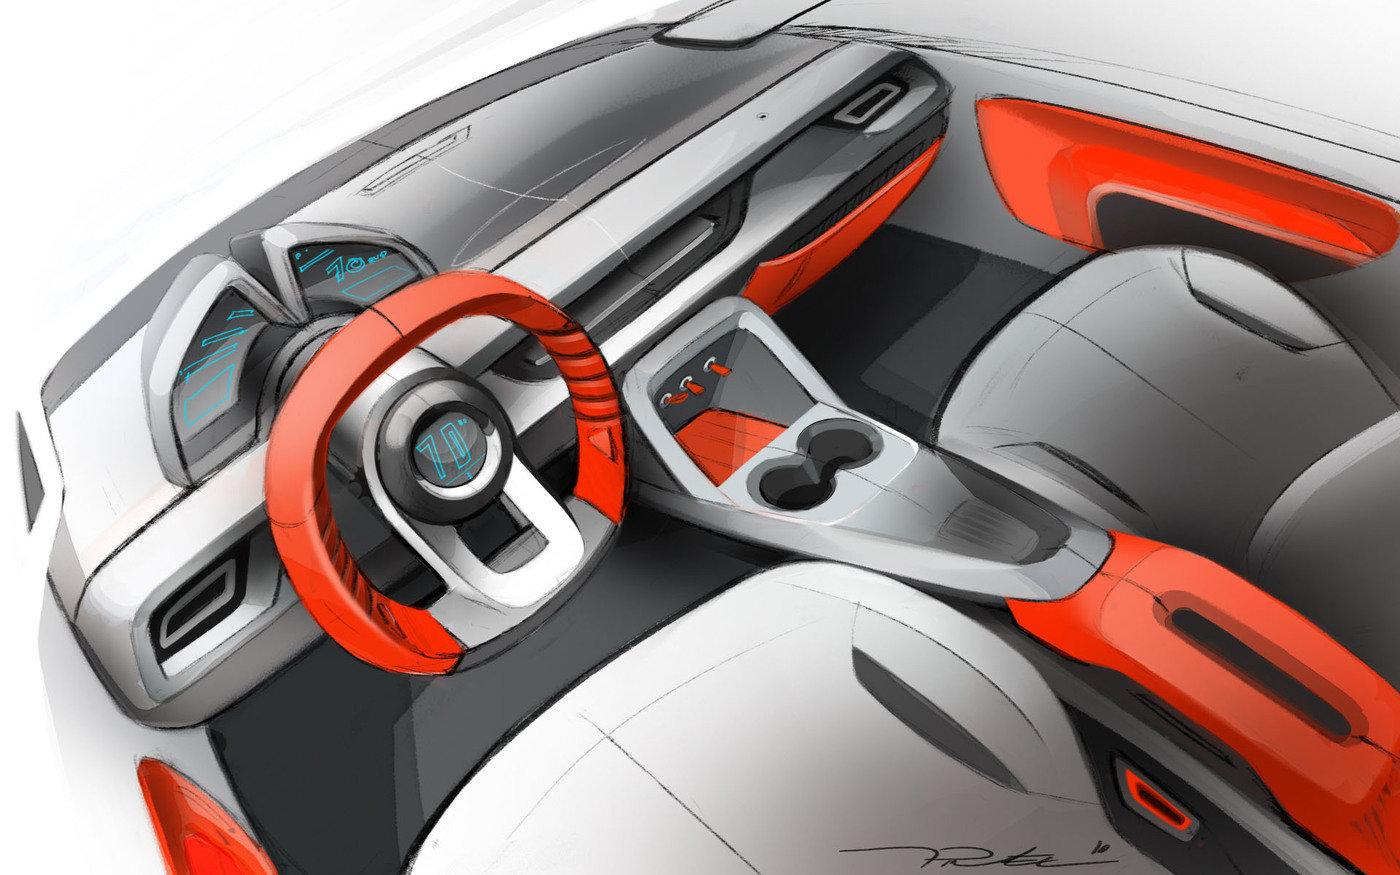 Interior car concept by Thomas Pinel at Coroflot.com